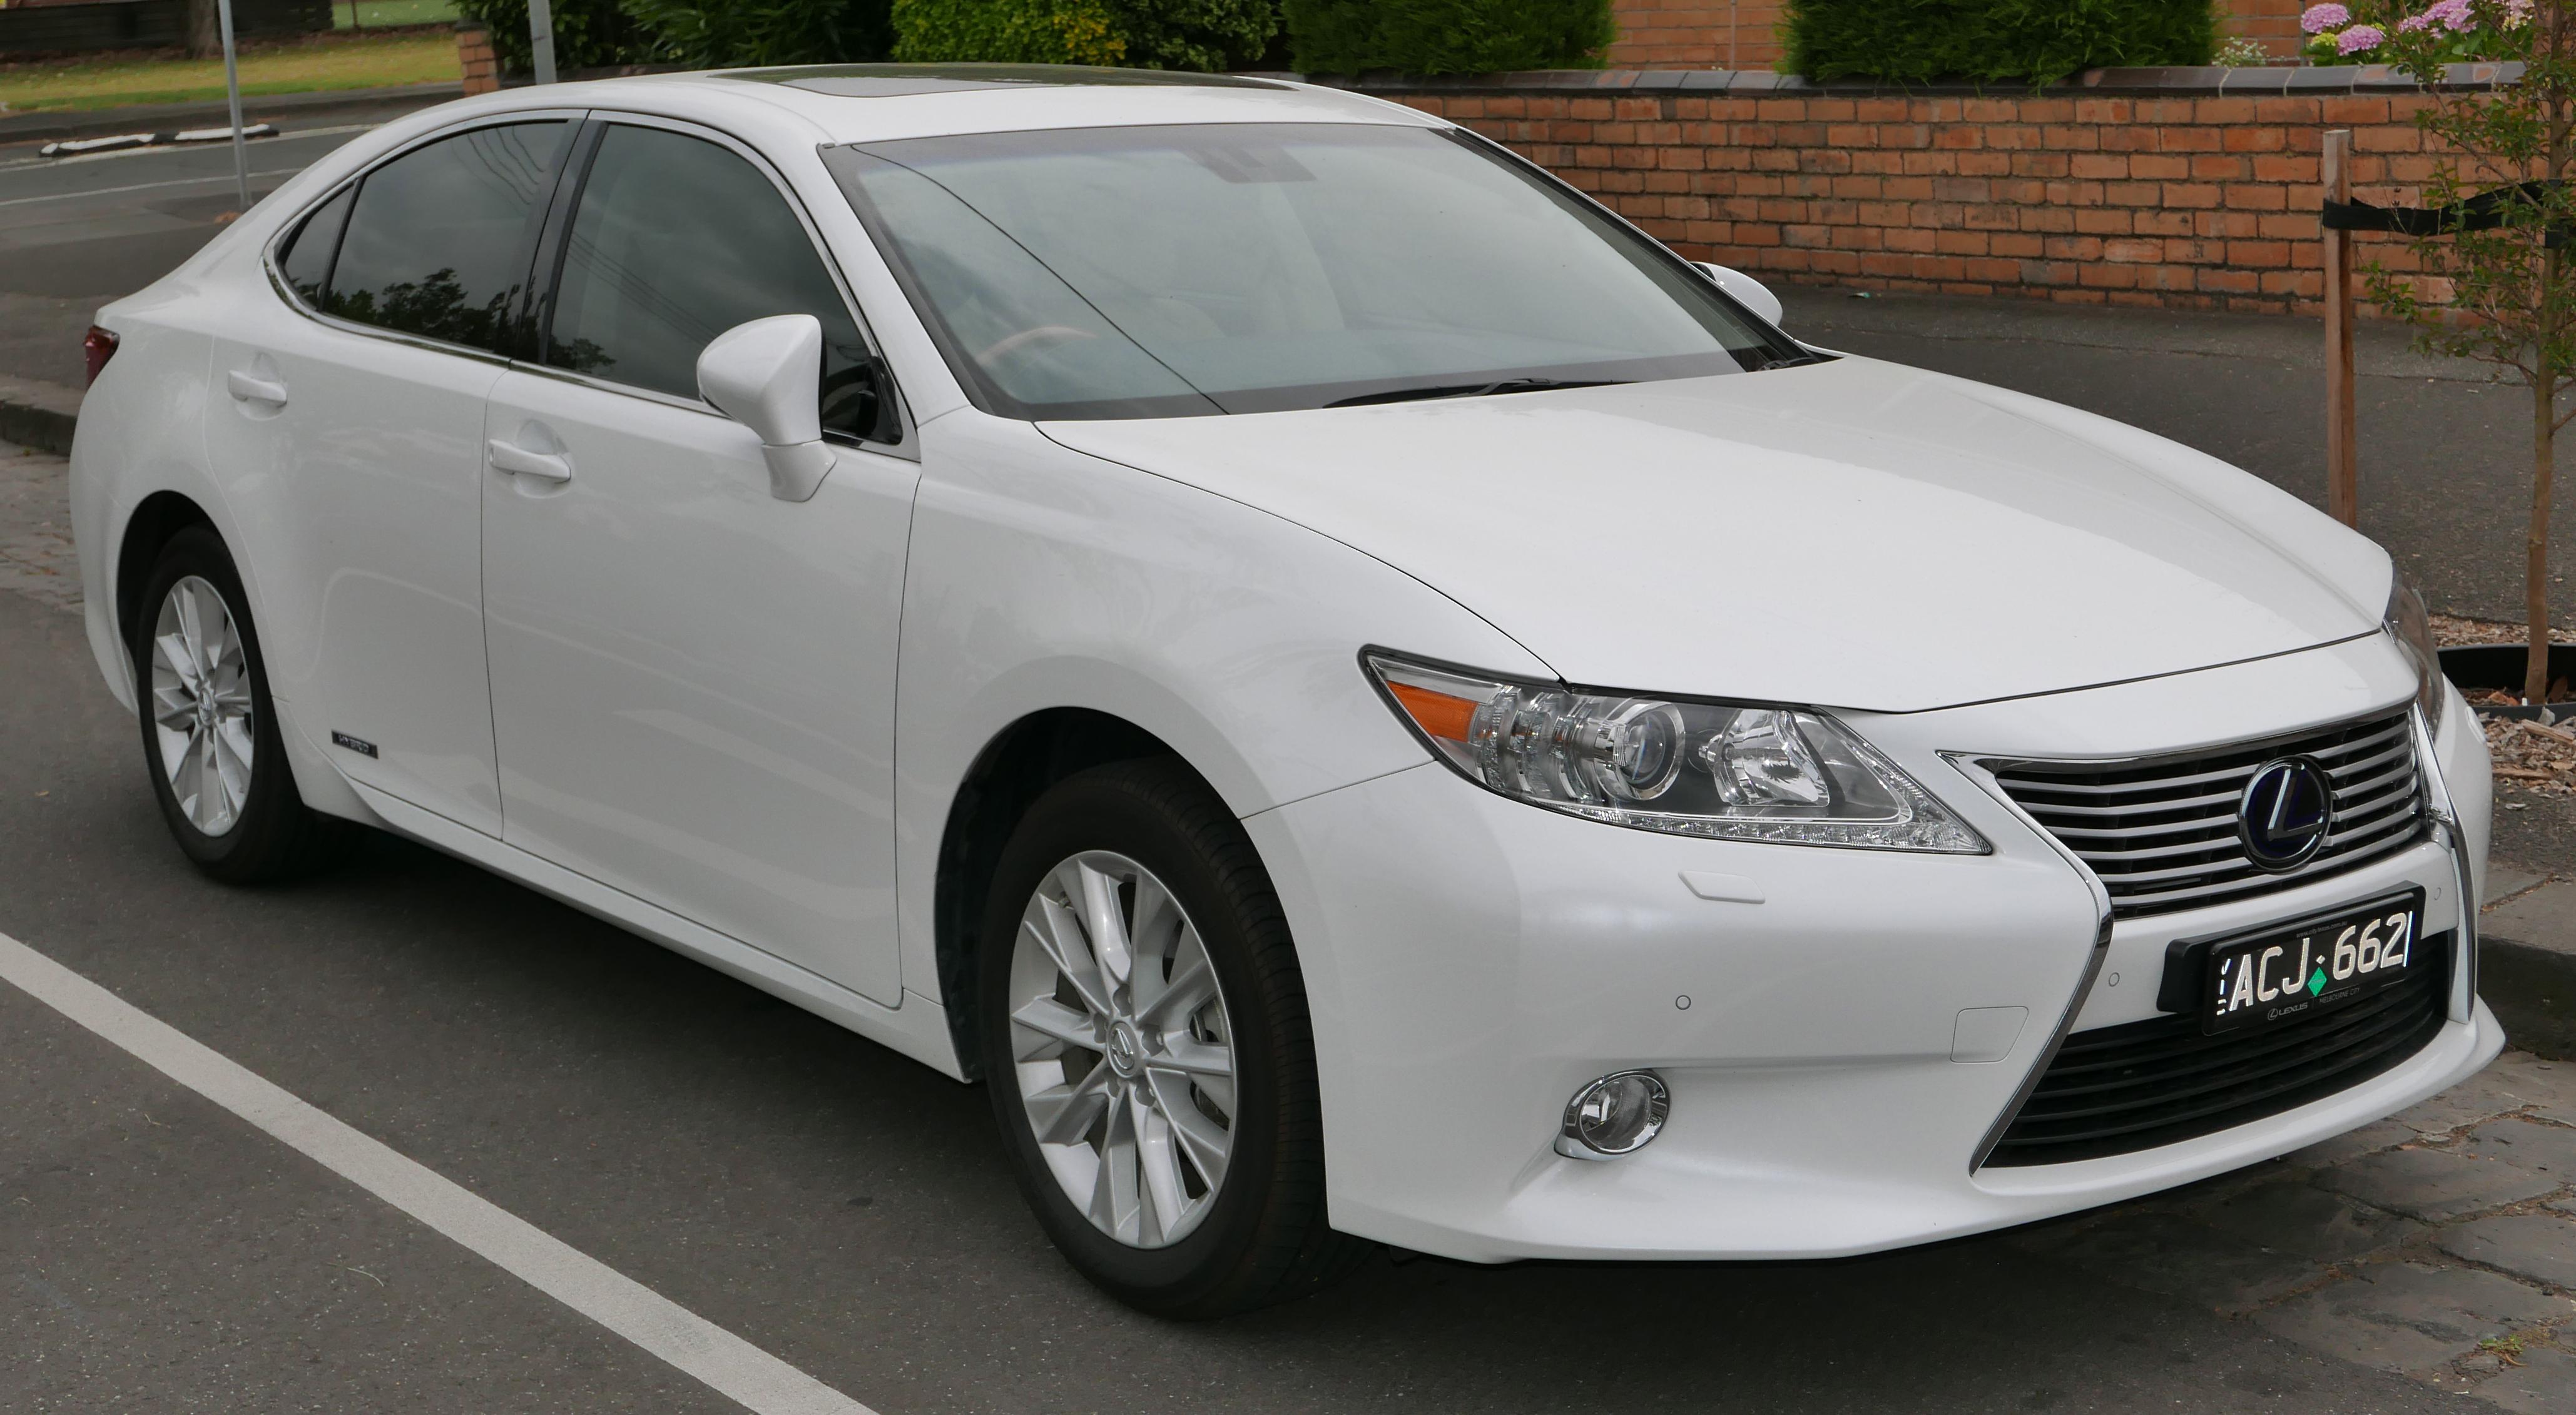 File:2013 Lexus ES 300h (AVV60R) Sports Luxury sedan (2015-12-07) 01 ...